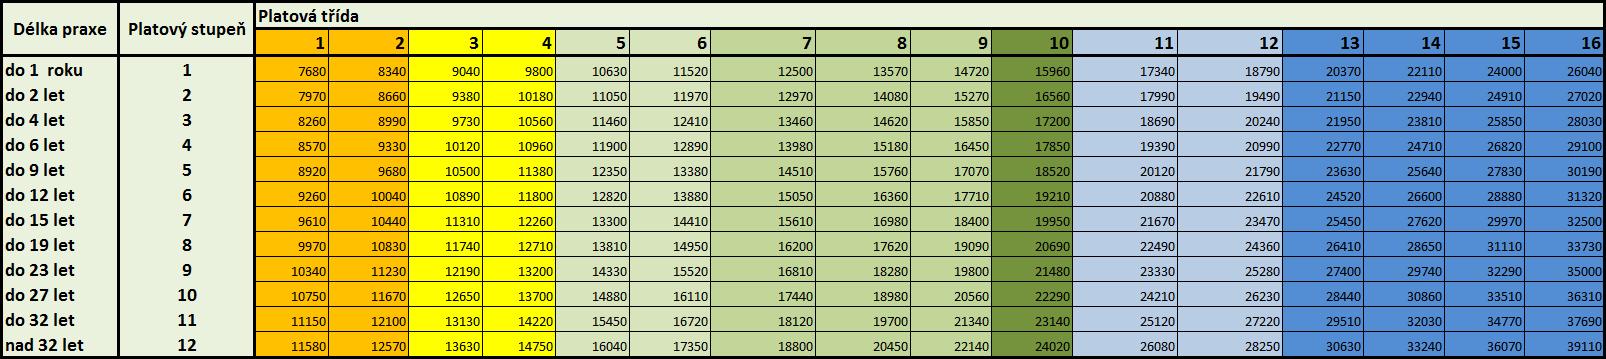 Platove tabulky 2016